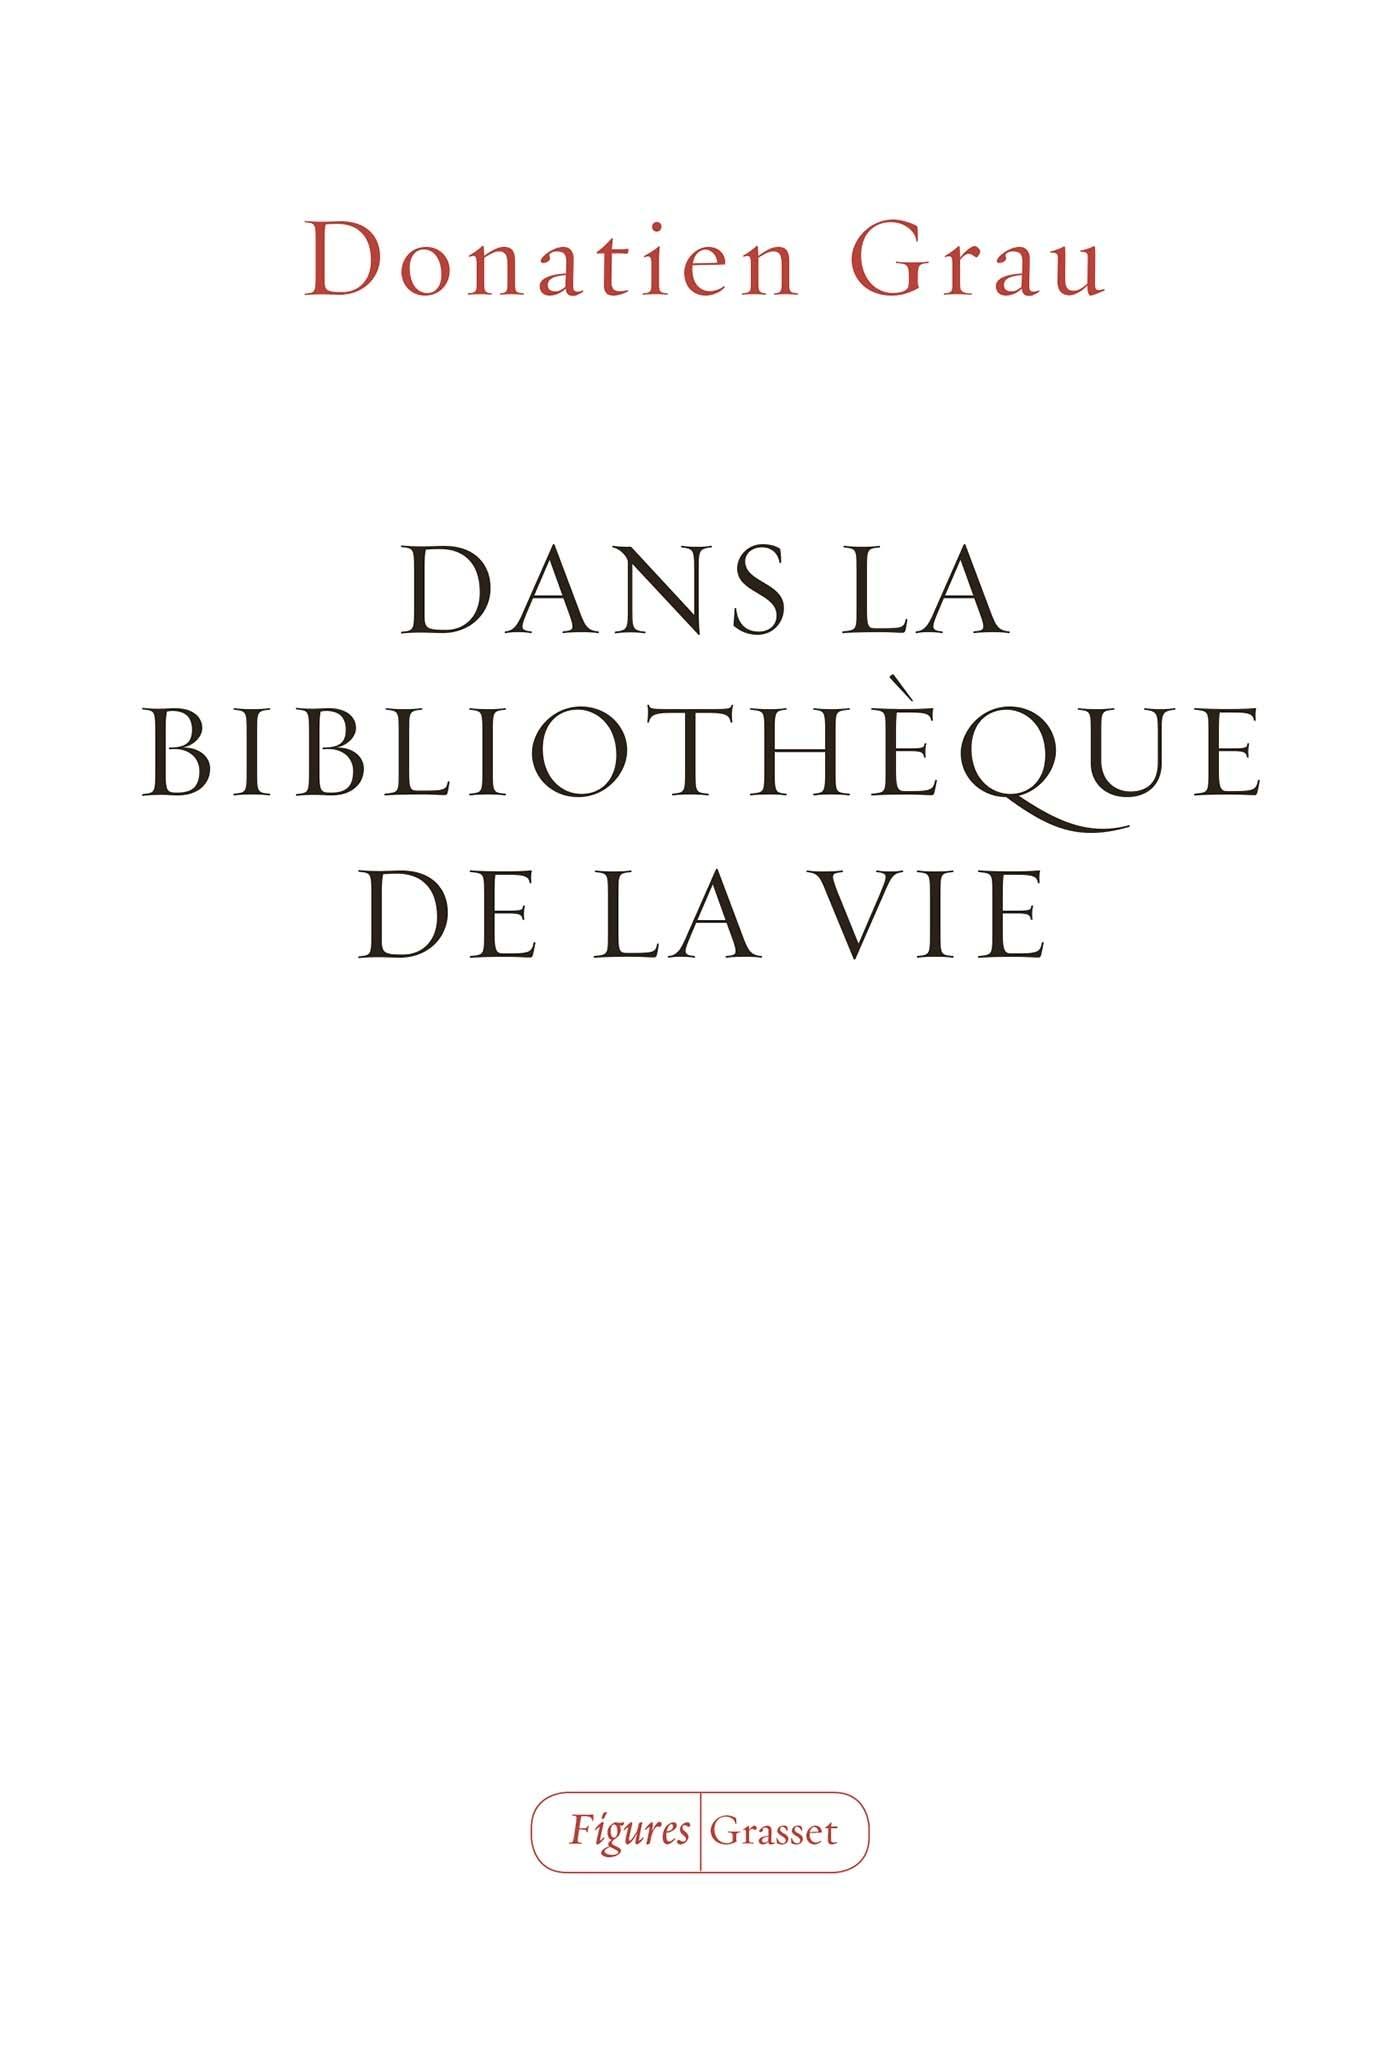 DANS LA BIBLIOTHEQUE DE LA VIE - ESSAI